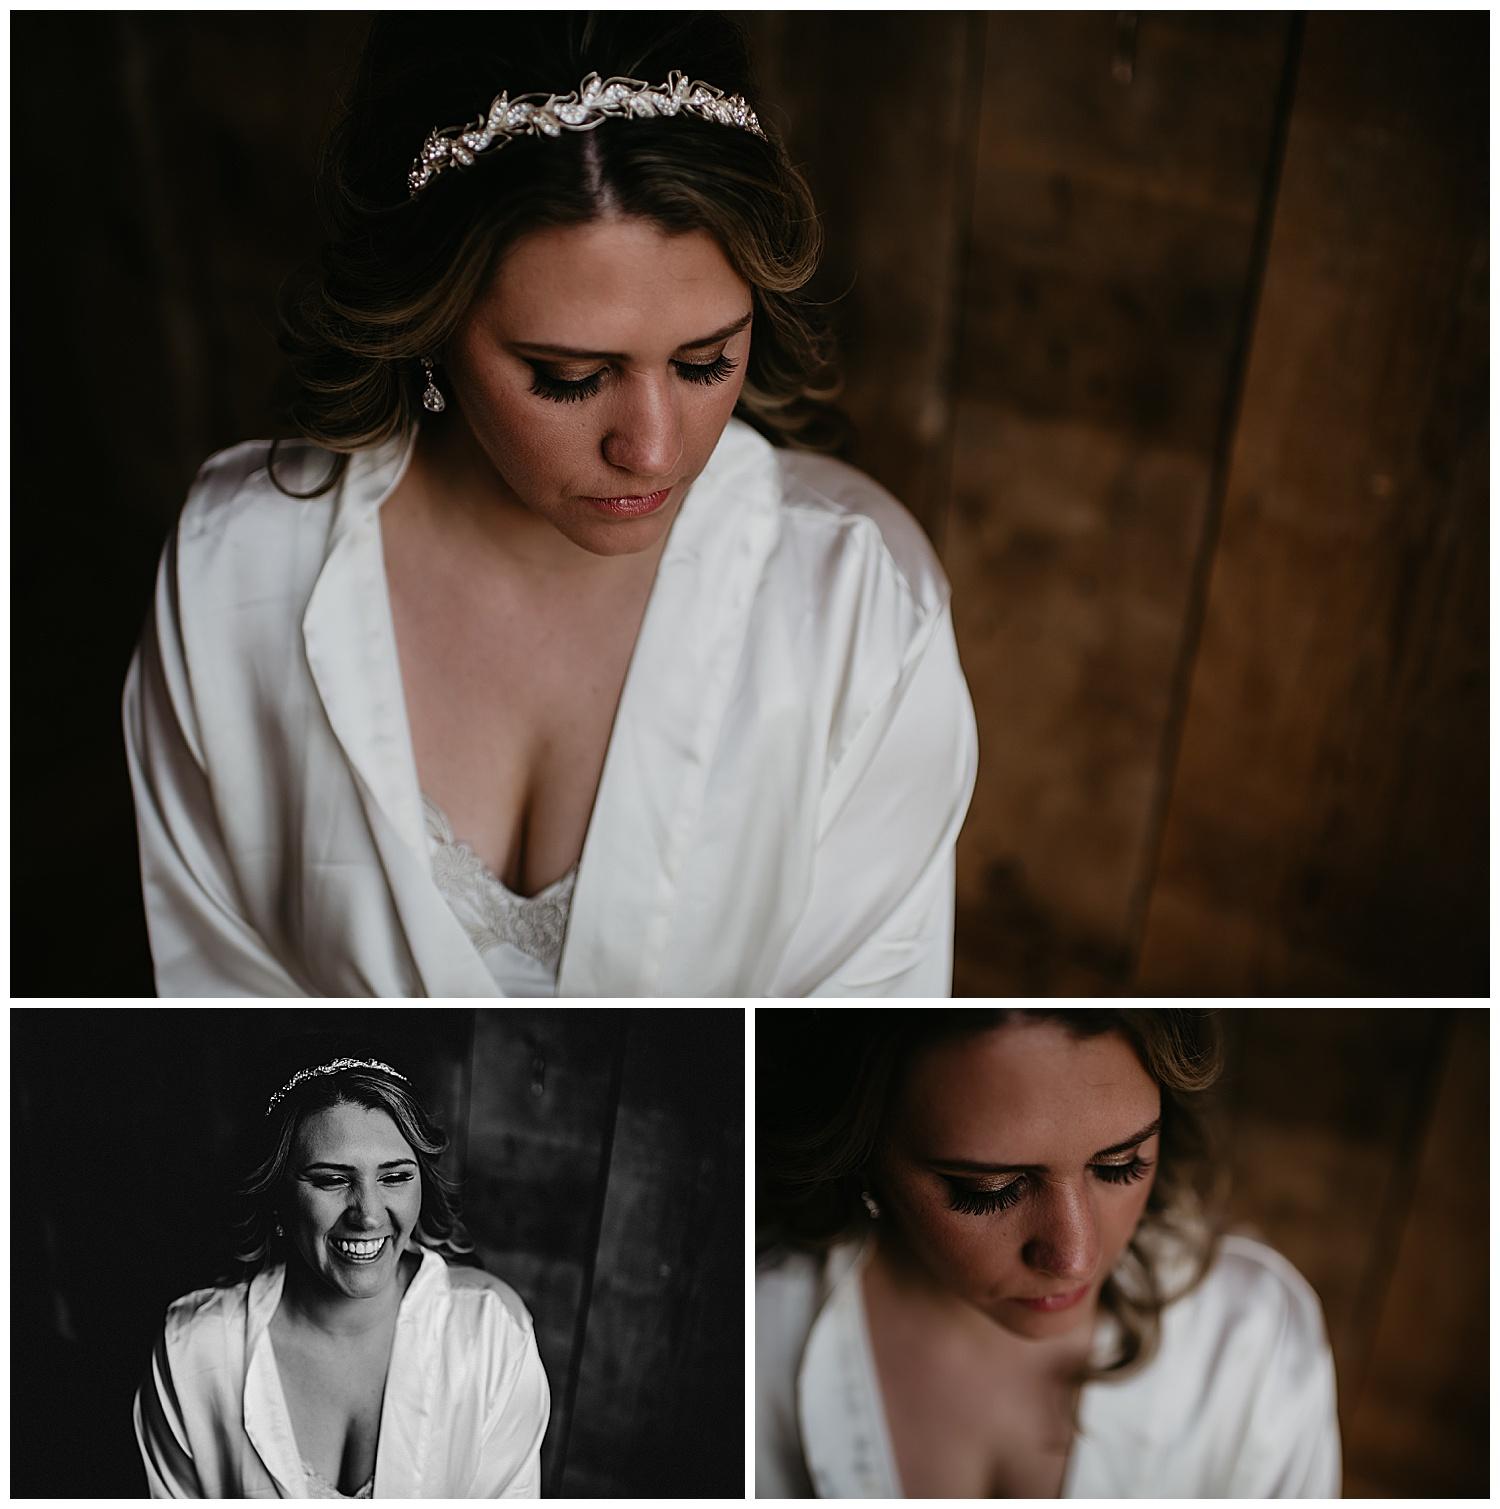 NEPA-Bloomgsburg-Wedding-Photographer-at-The-Barn-at-Greystone-Farms-Watsontown-PA_0011.jpg